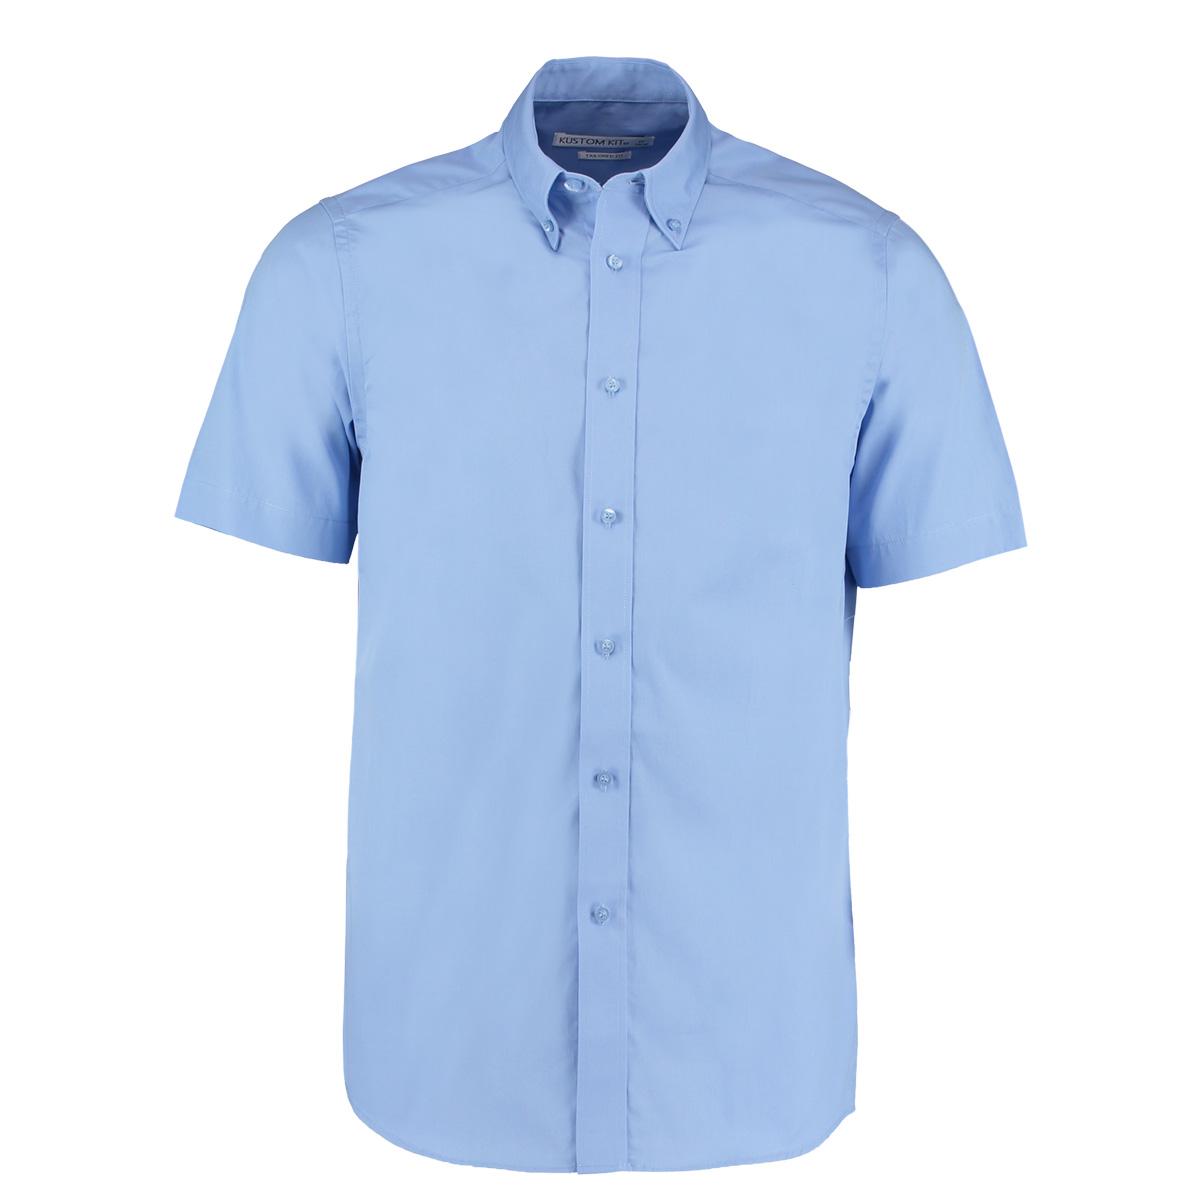 100% Cotton Short Sleeve Oxford Shirt